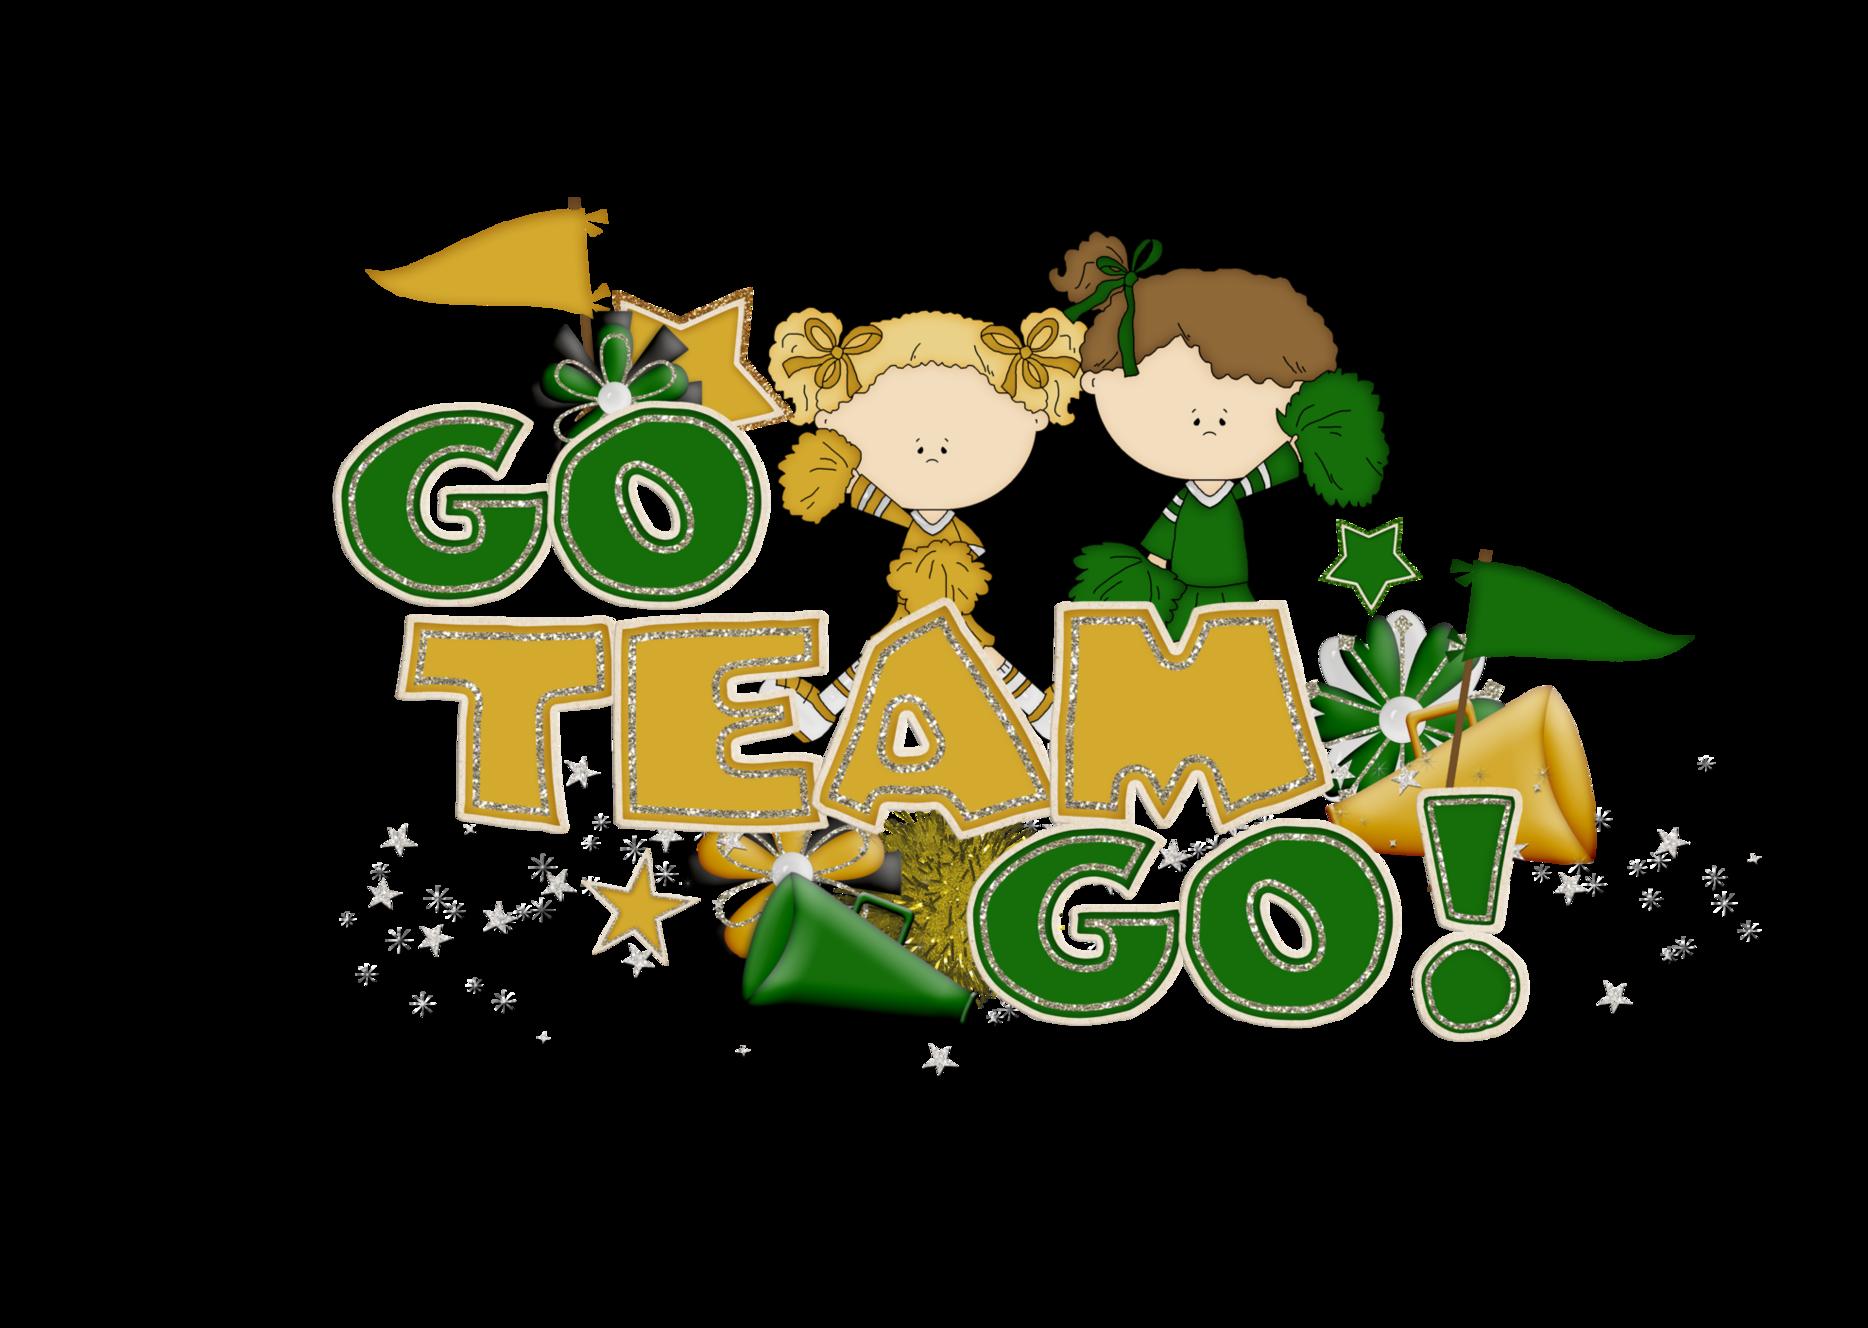 Christmas cheerleader clipart vector The Go! Team Cheerleading Clip art - cheer 1868*1328 transprent Png ... vector